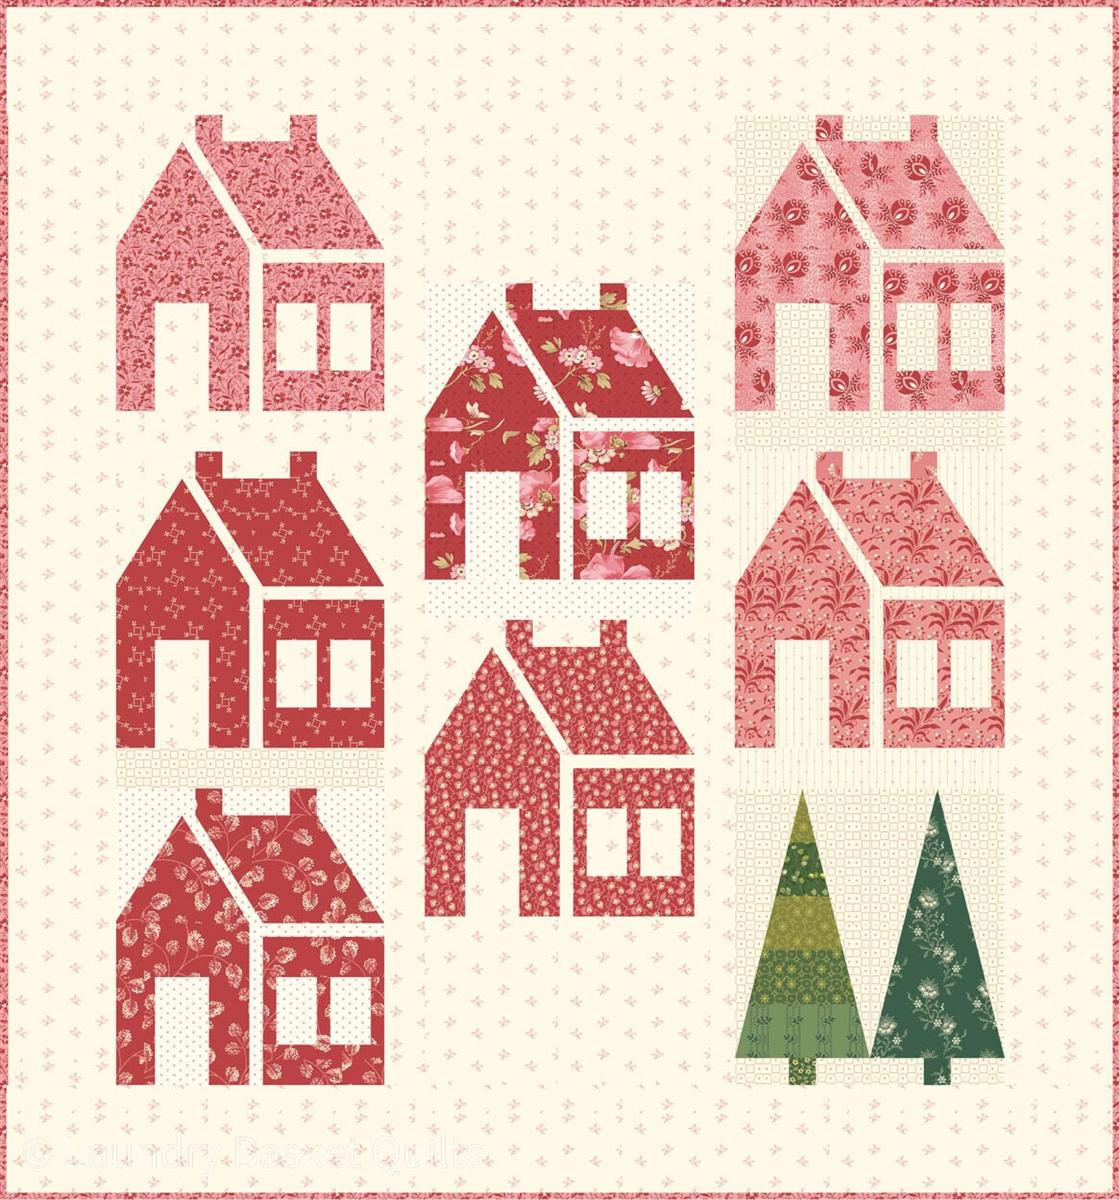 Barn Quilt Patterns From Edyta Sitar